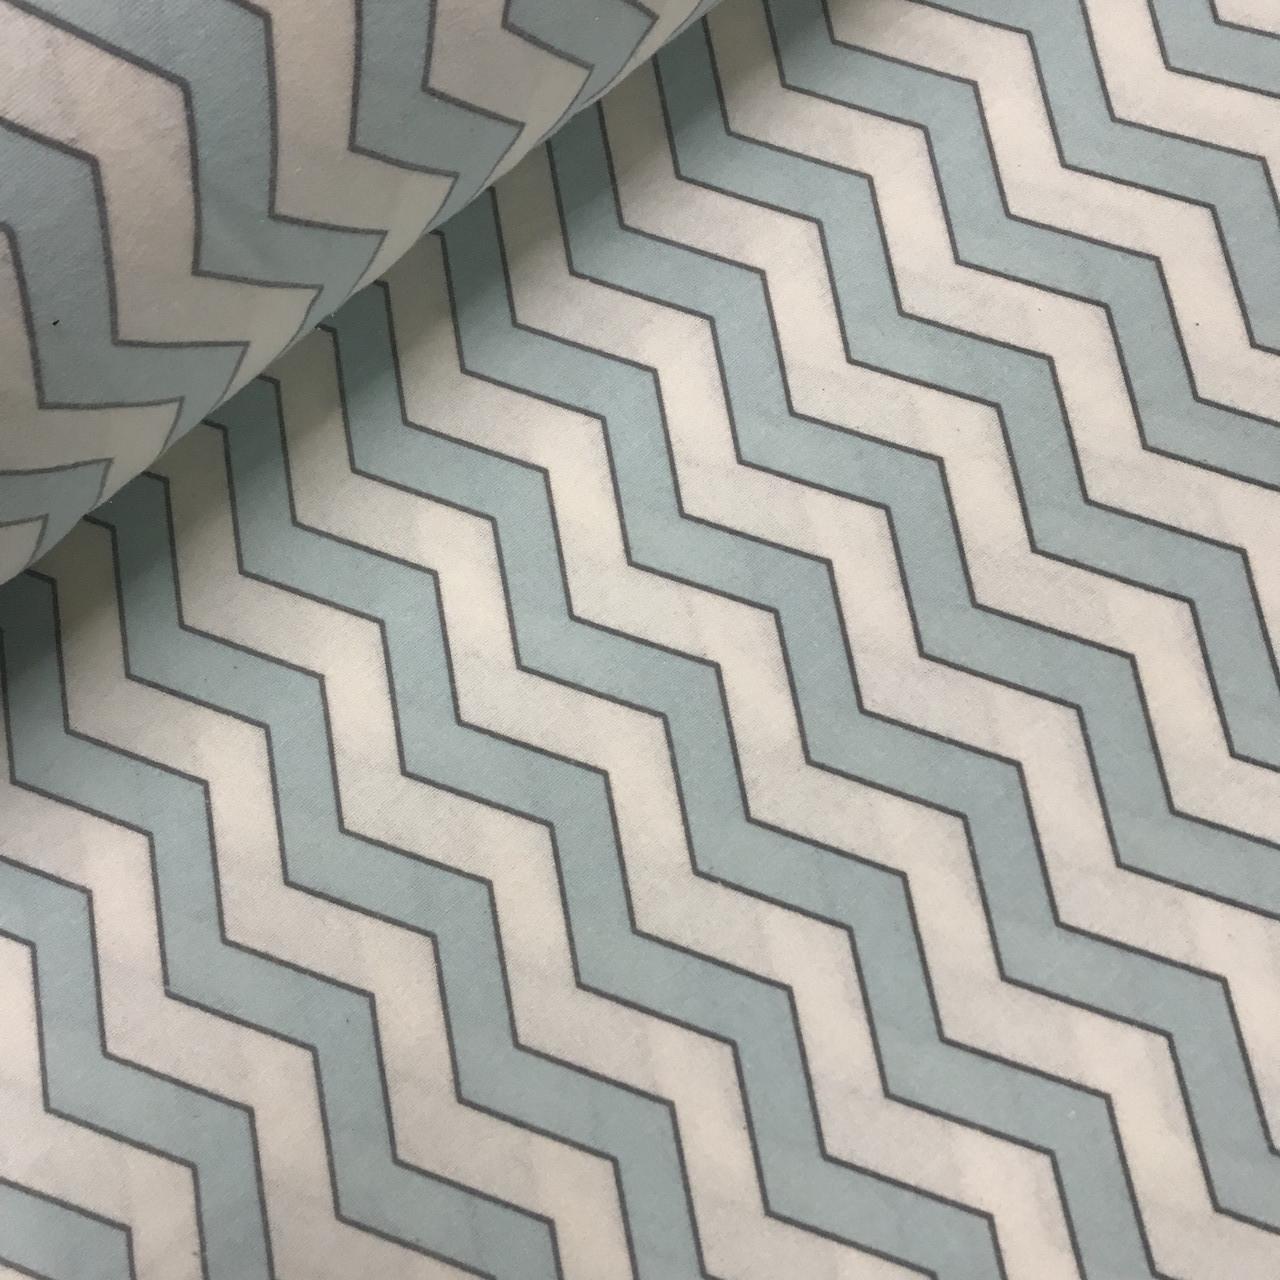 Фланелевая ткань зигзаг светло-бирюзовый на белом (шир. 2,4 м)